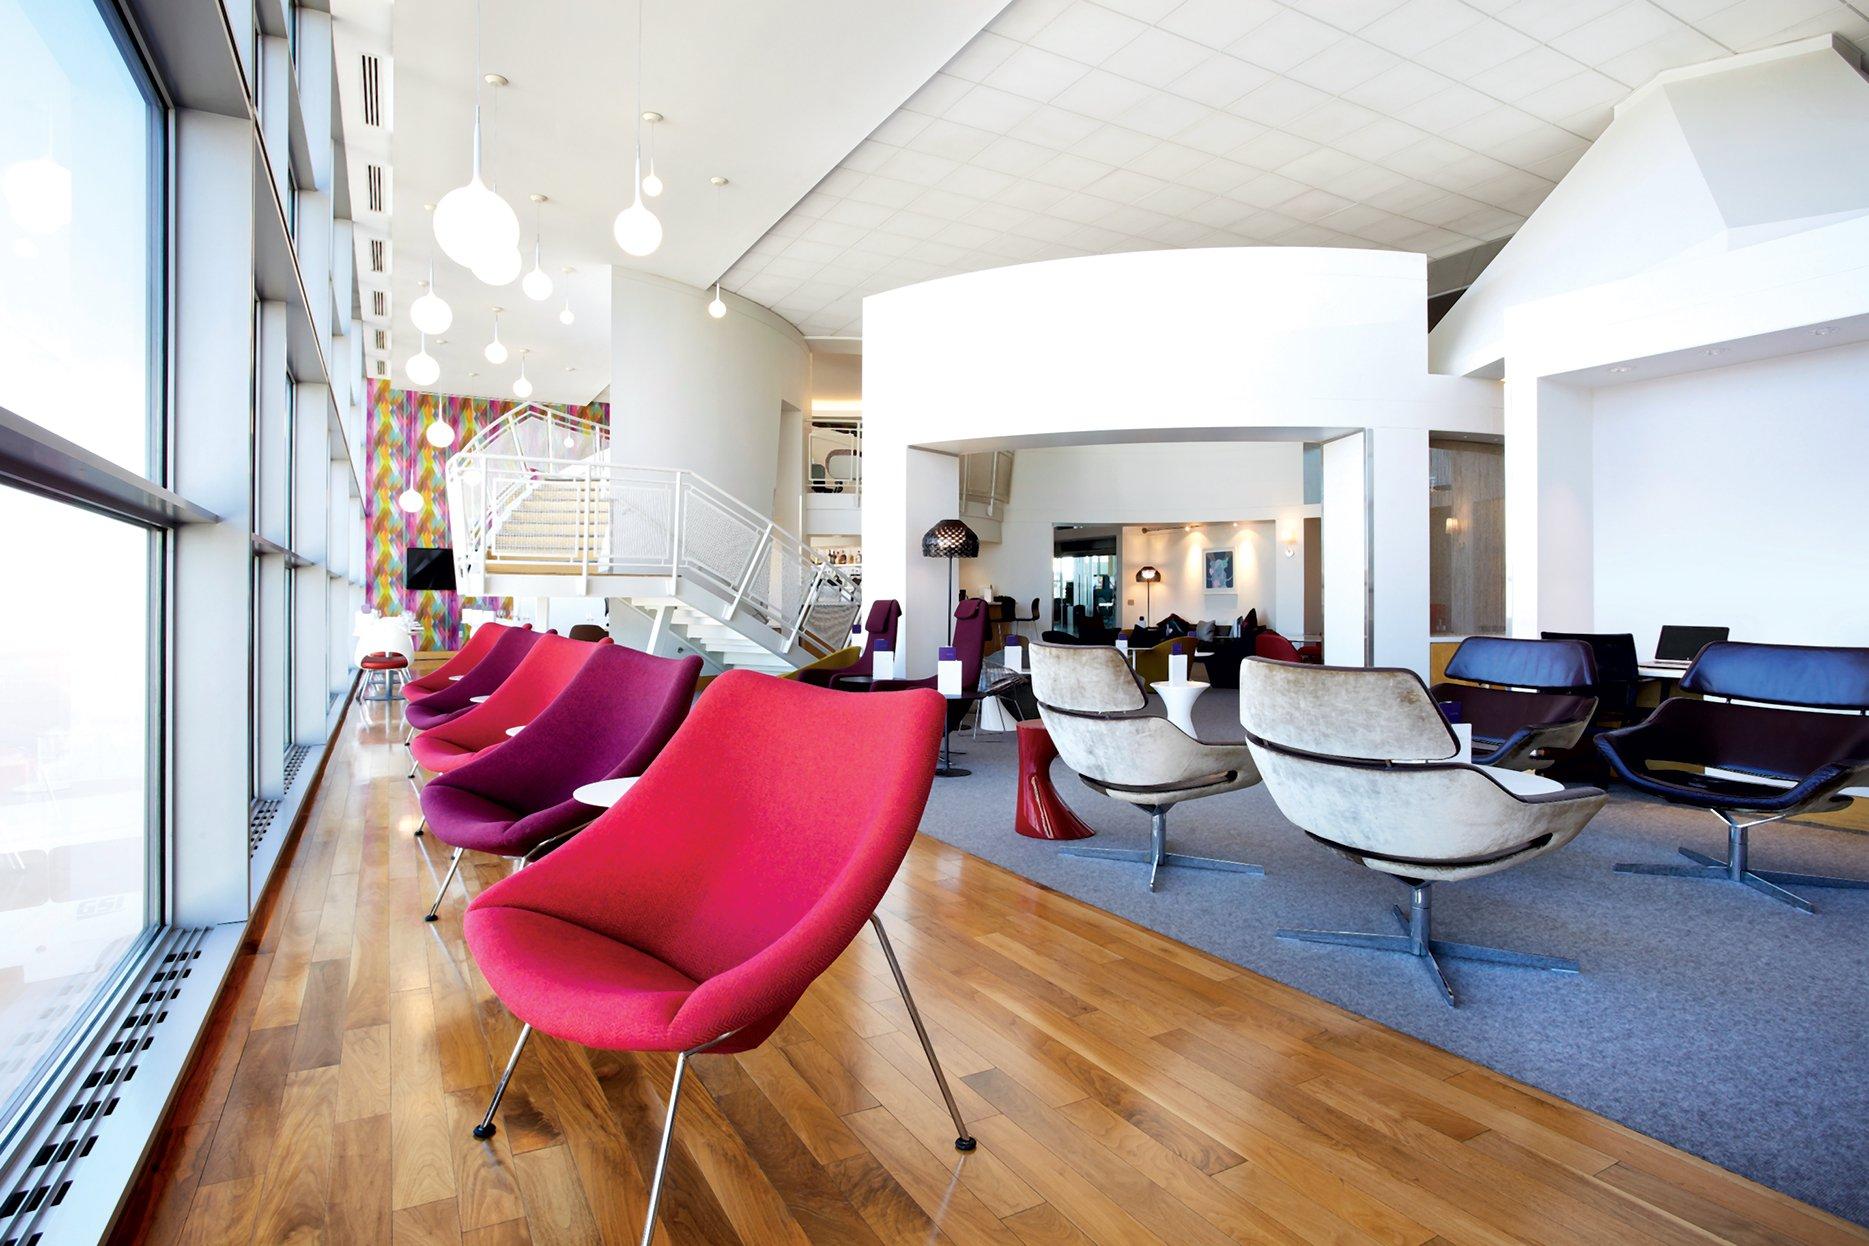 The Virgin Atlantic lounge at Dulles. Photograph courtesy of Virgin Atlantic.